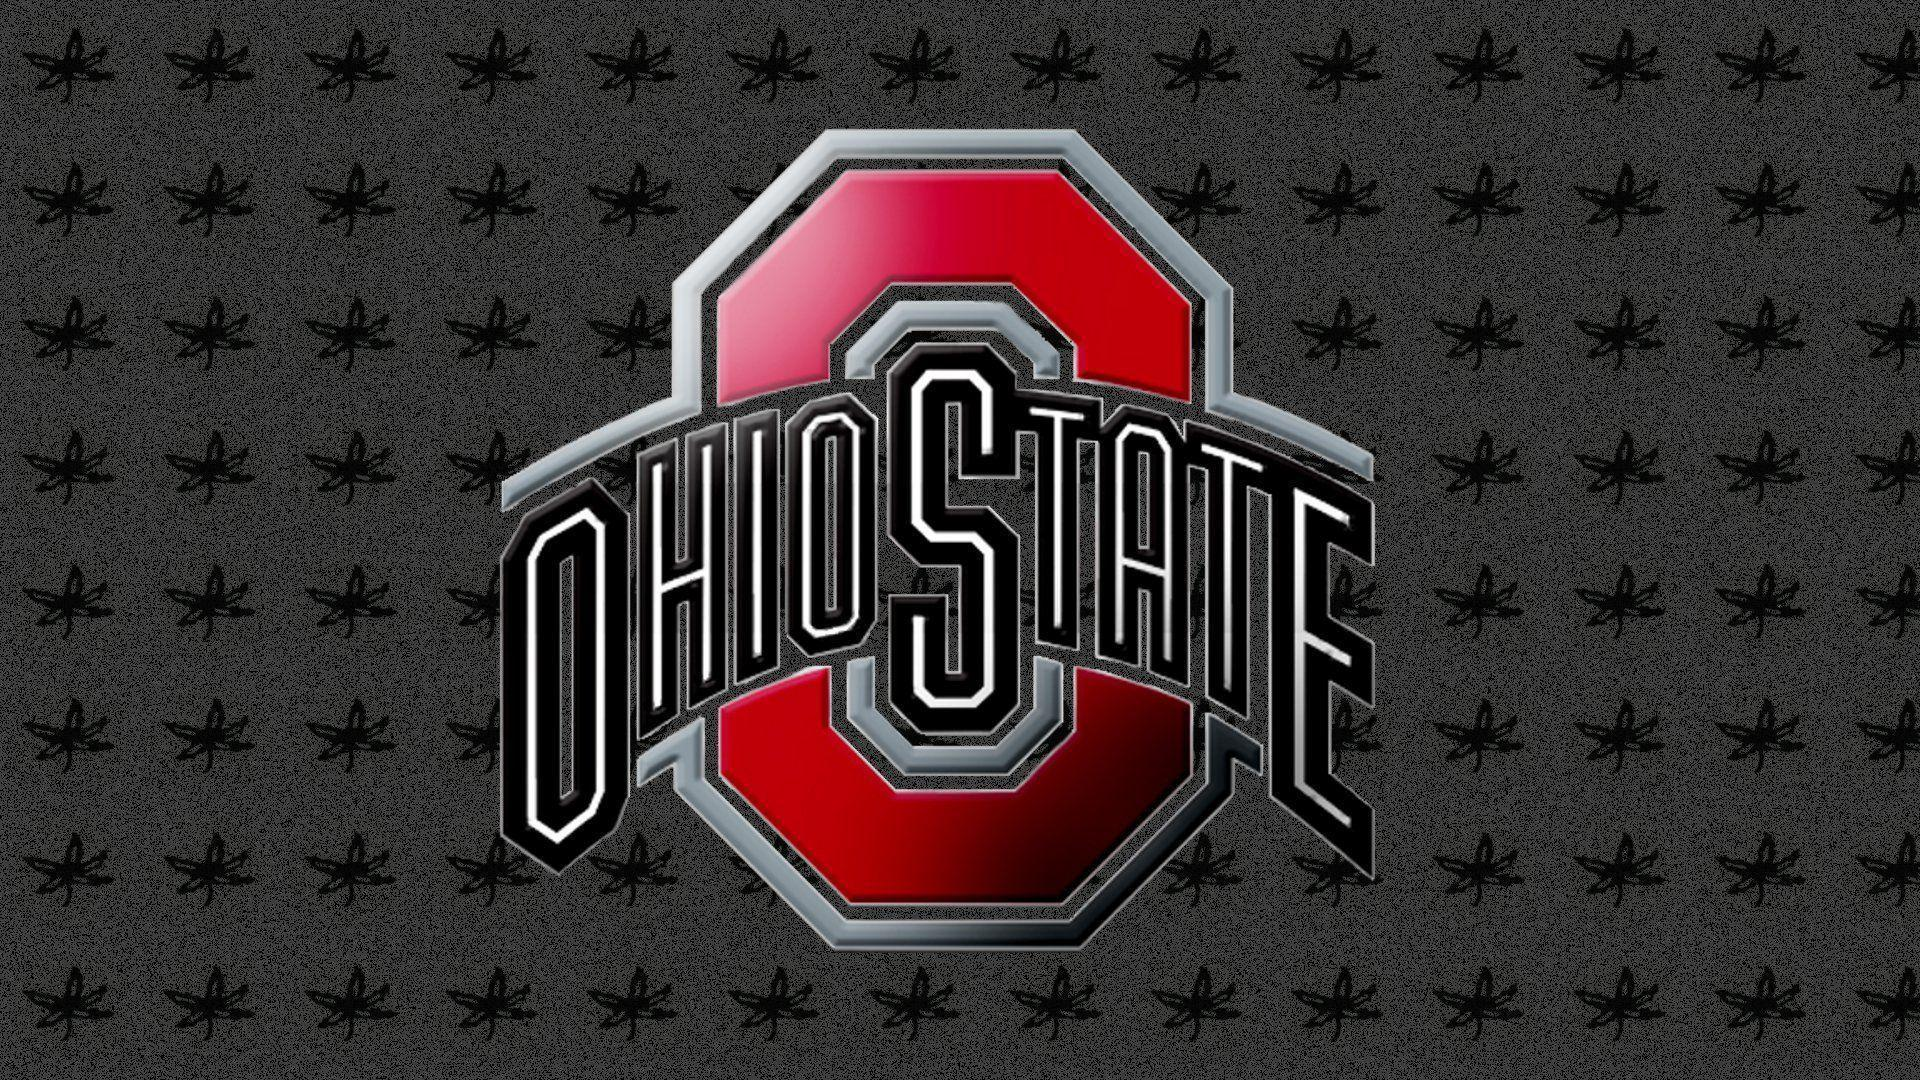 Ohio State Buckeyes Wallpapers Top Free Ohio State Buckeyes Backgrounds Wallpaperaccess